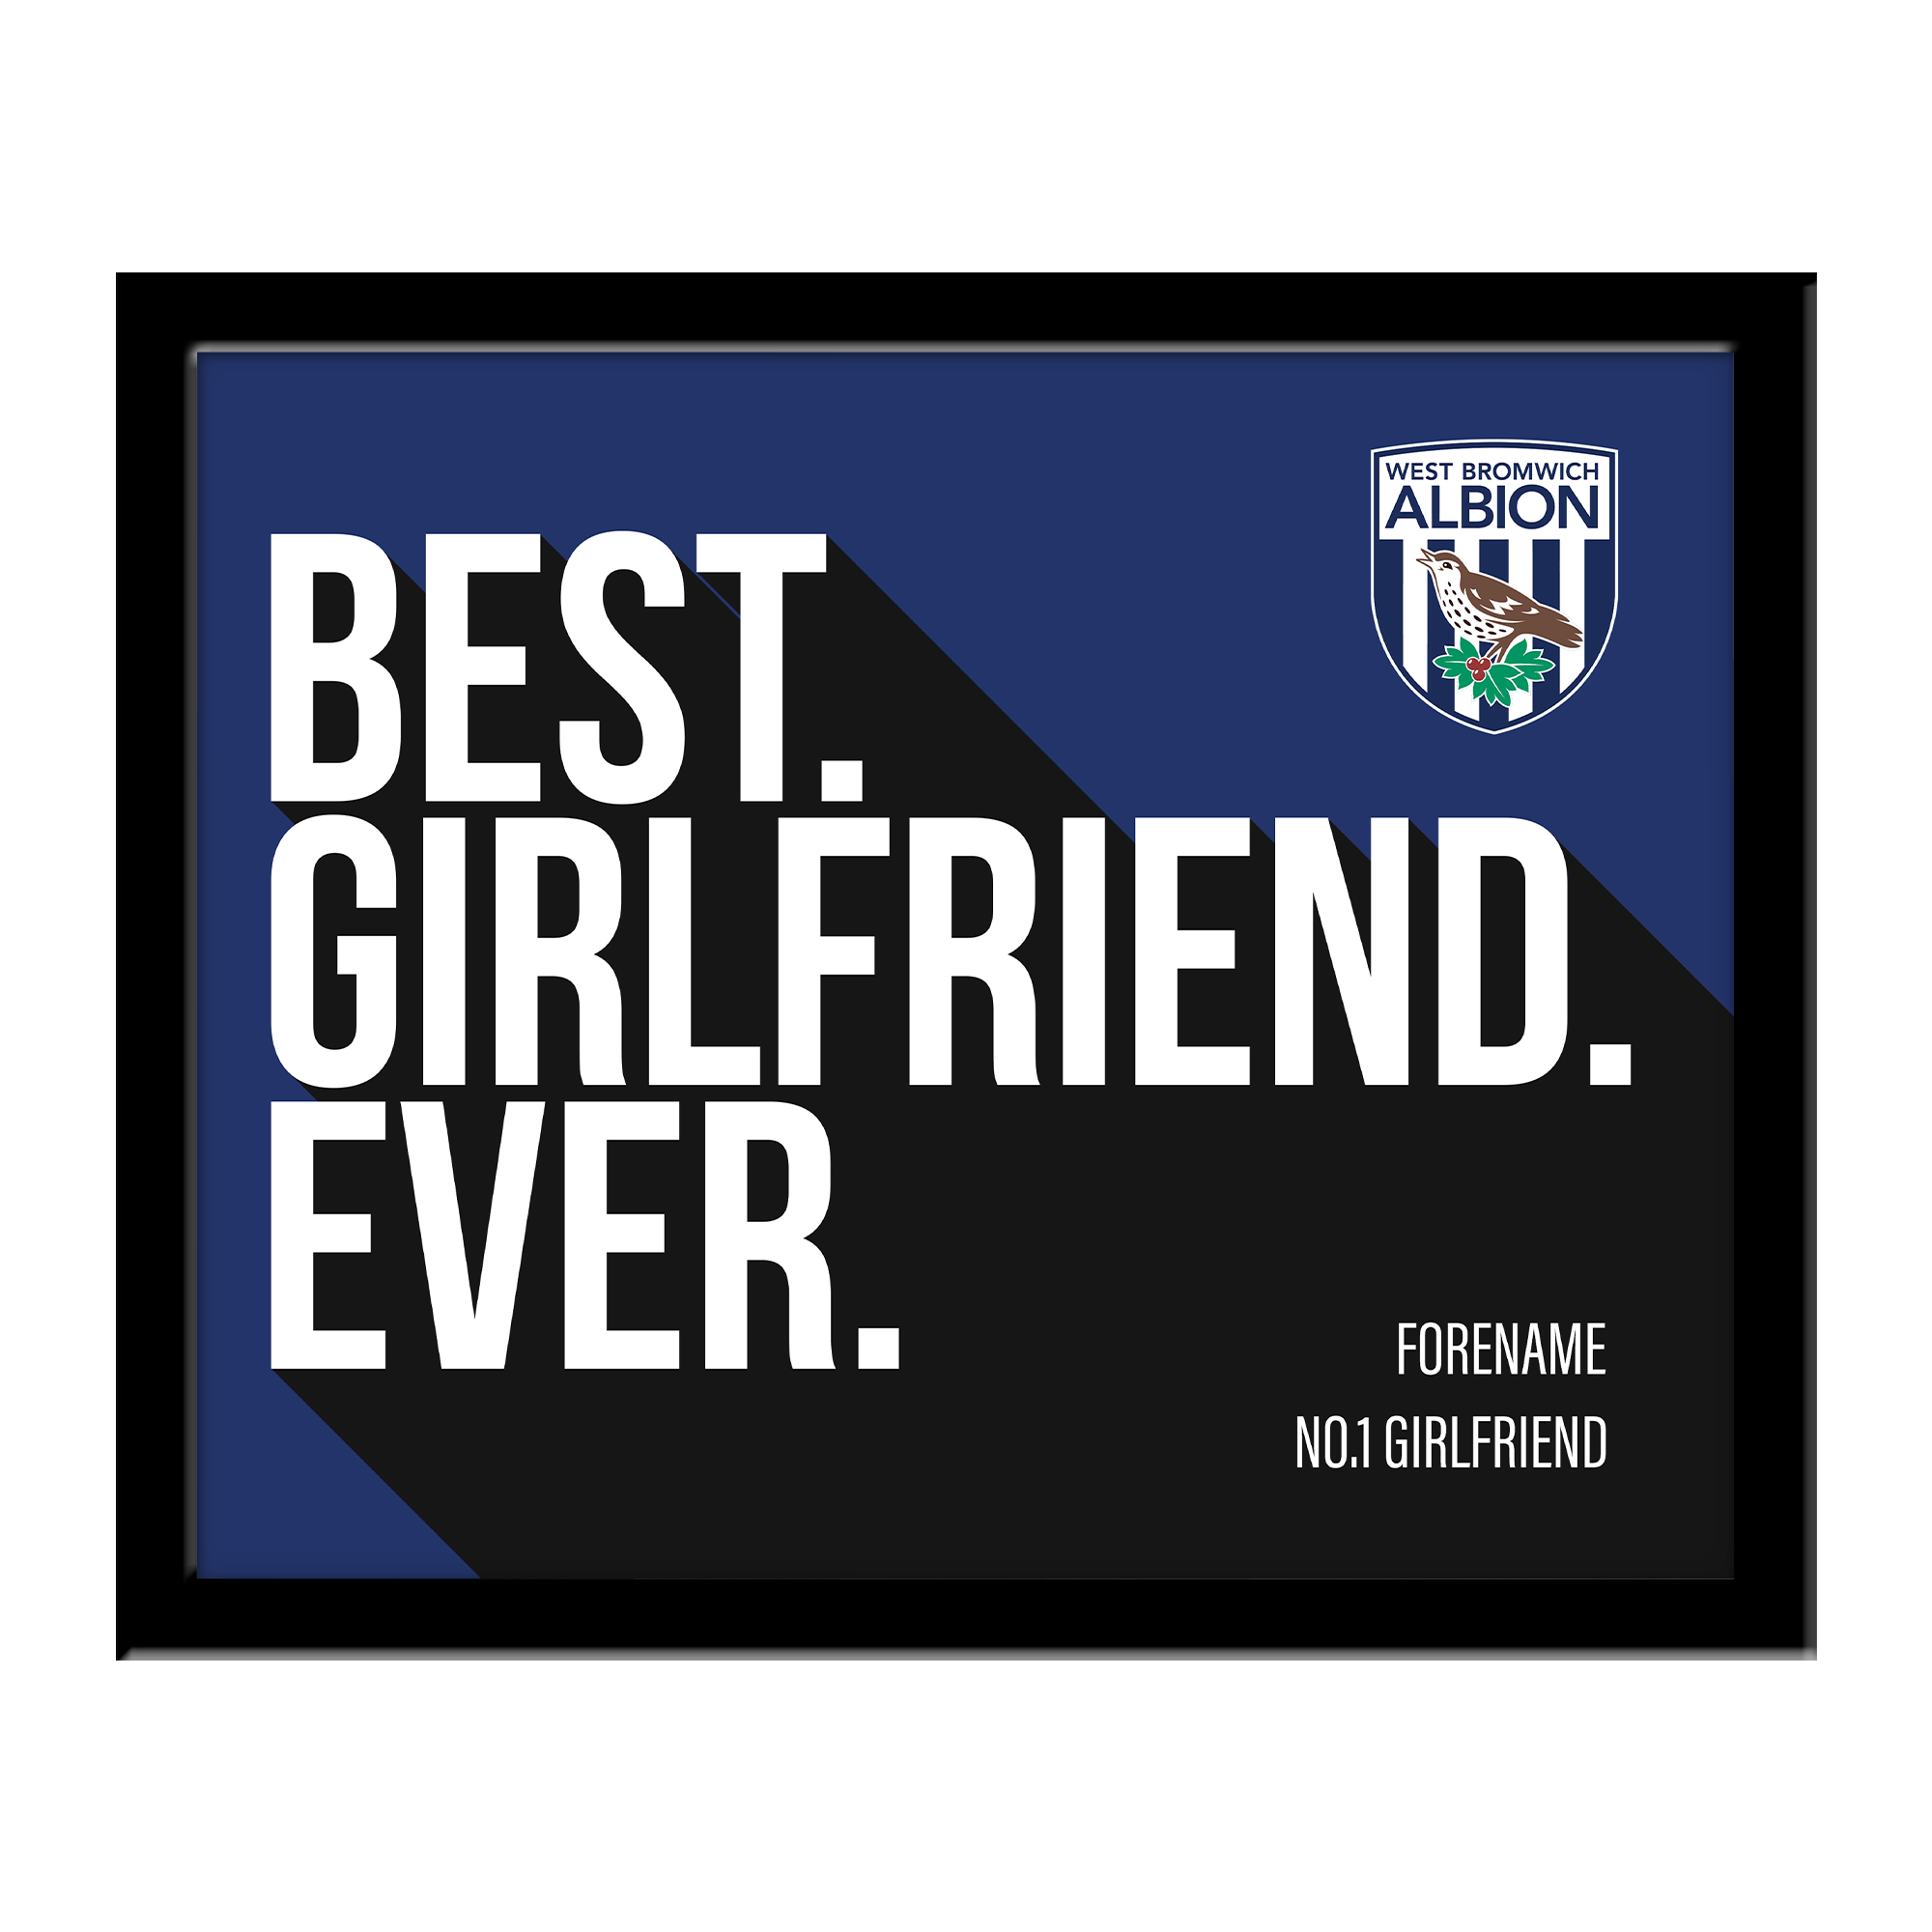 West Bromwich Albion FC Best Girlfriend Ever 10 x 8 Photo Framed